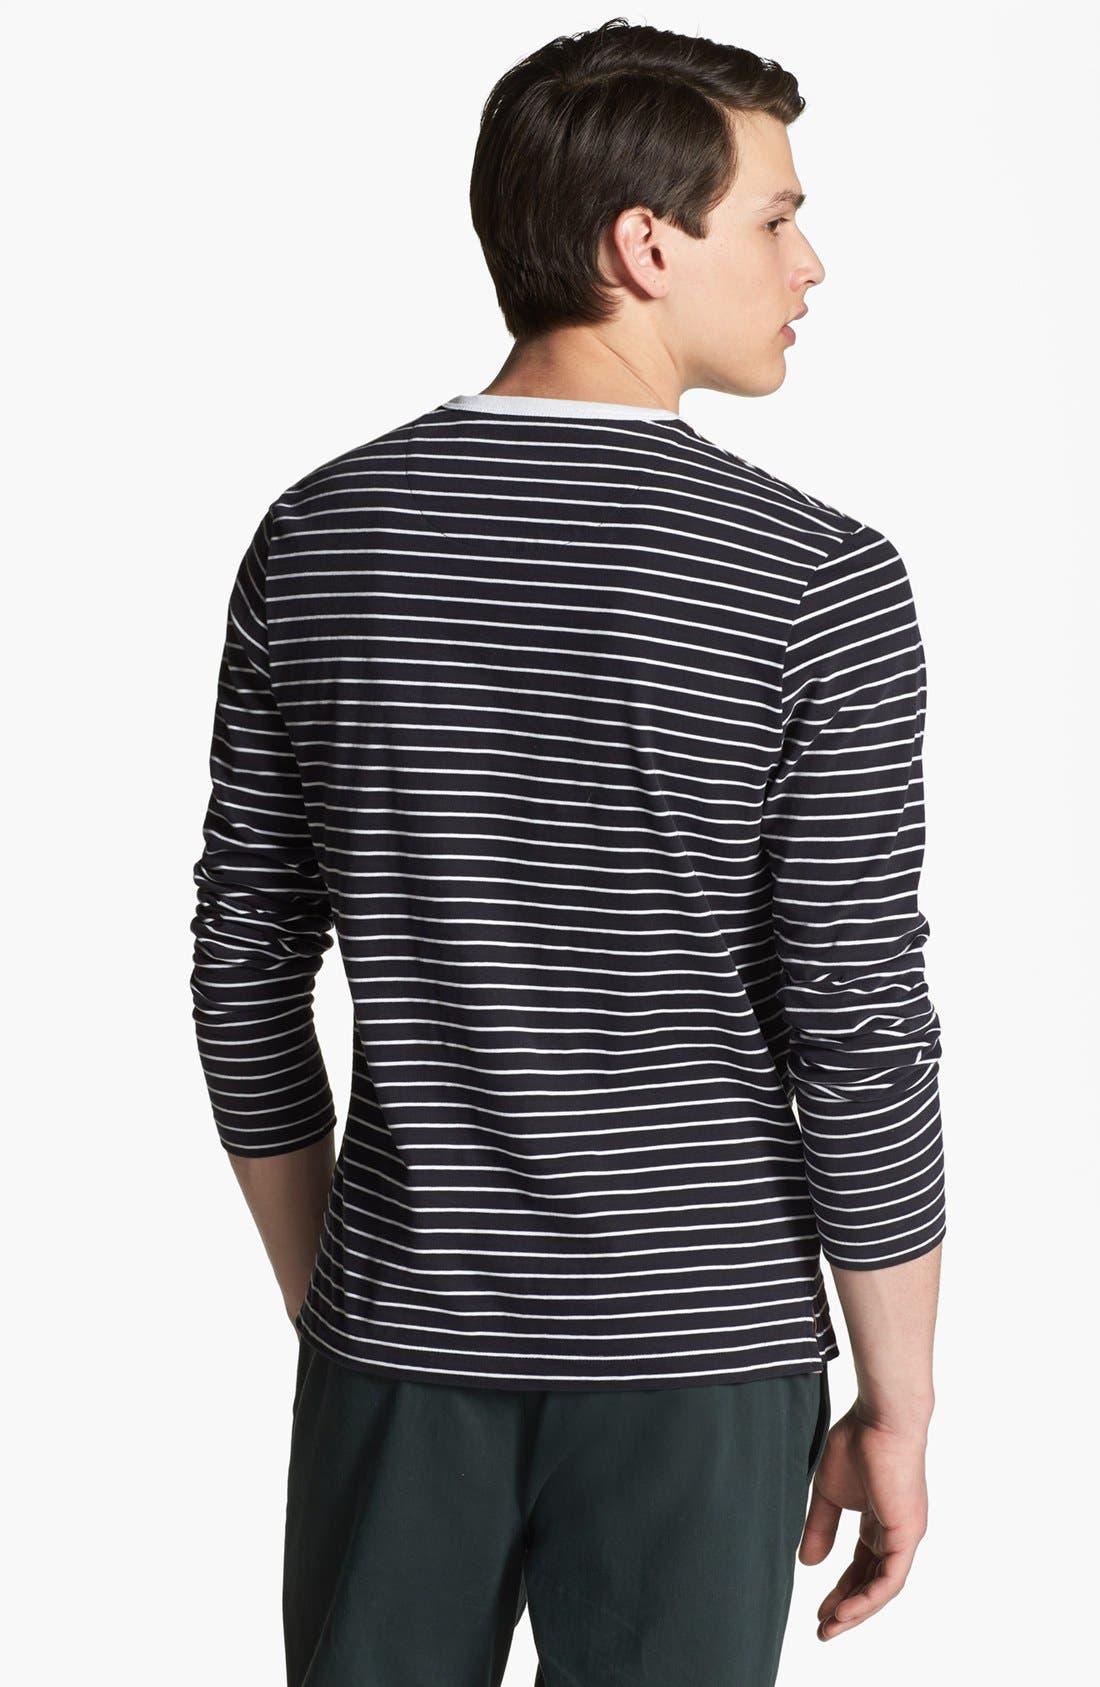 SHIPLEY & HALMOS, 'Spaniel' Stripe Long Sleeve T-Shirt, Alternate thumbnail 3, color, 414